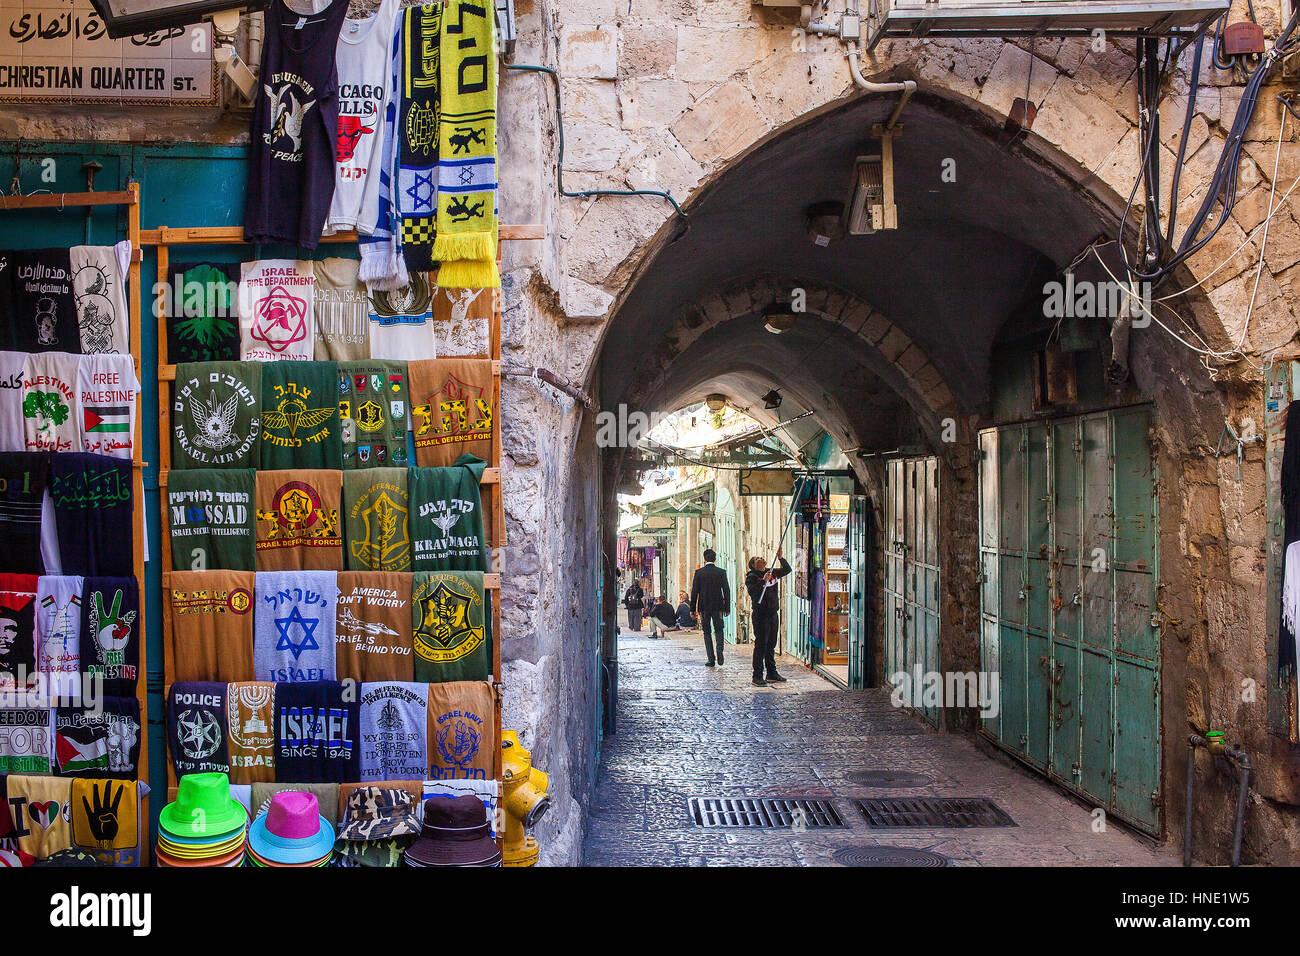 Christian quarter street, Souk Arabic market, Old City, Jerusalem, Israel. - Stock Image